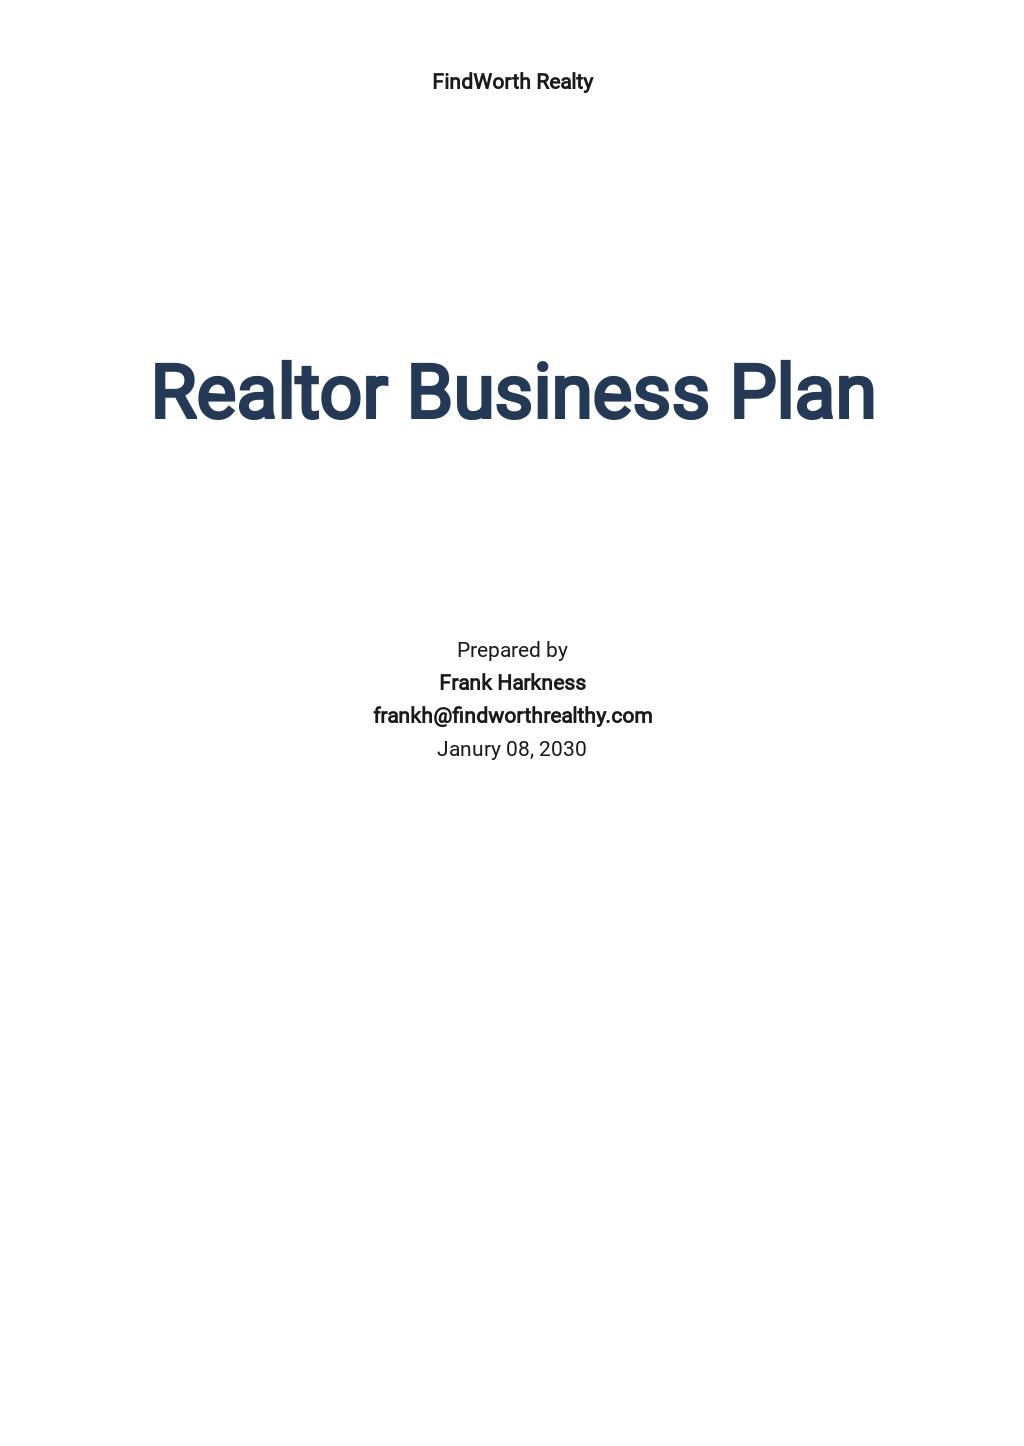 Realtor Business Plan Template